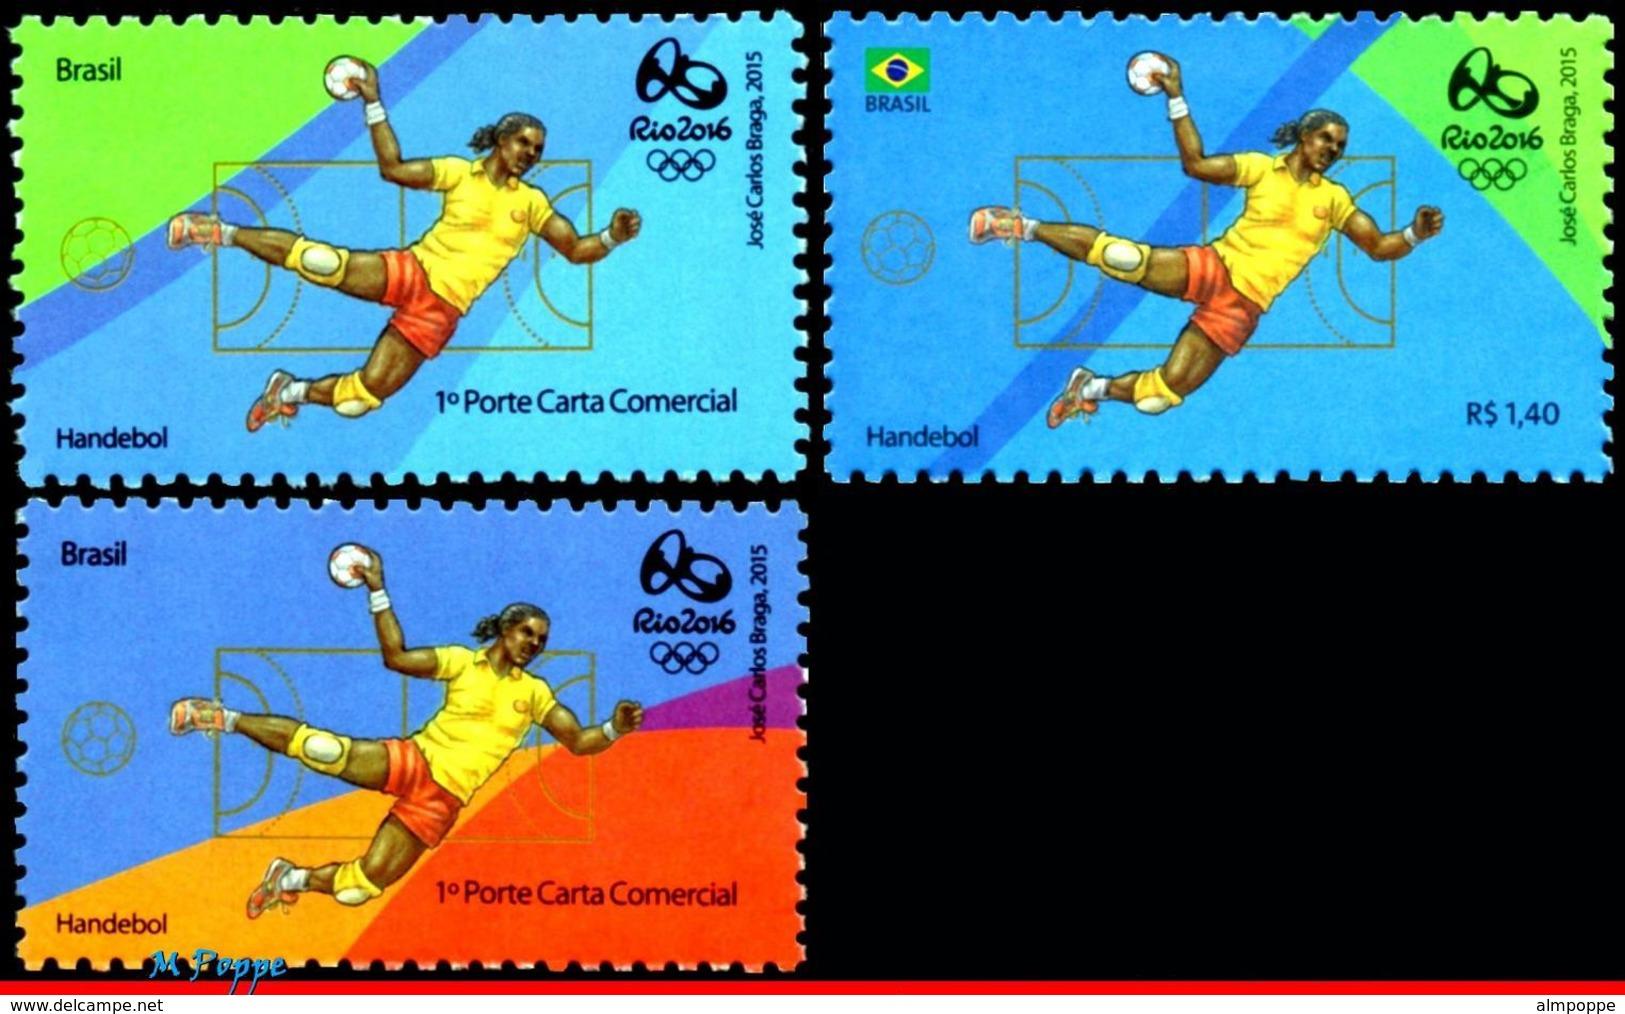 Ref. BR-OLYM-E20 BRAZIL 2015 SPORTS, OLYMPIC GAMES, RIO 2016,, HANDBALL, STAMPS OF 2ND & 4TH SHEET, MNH 3V - Balonmano